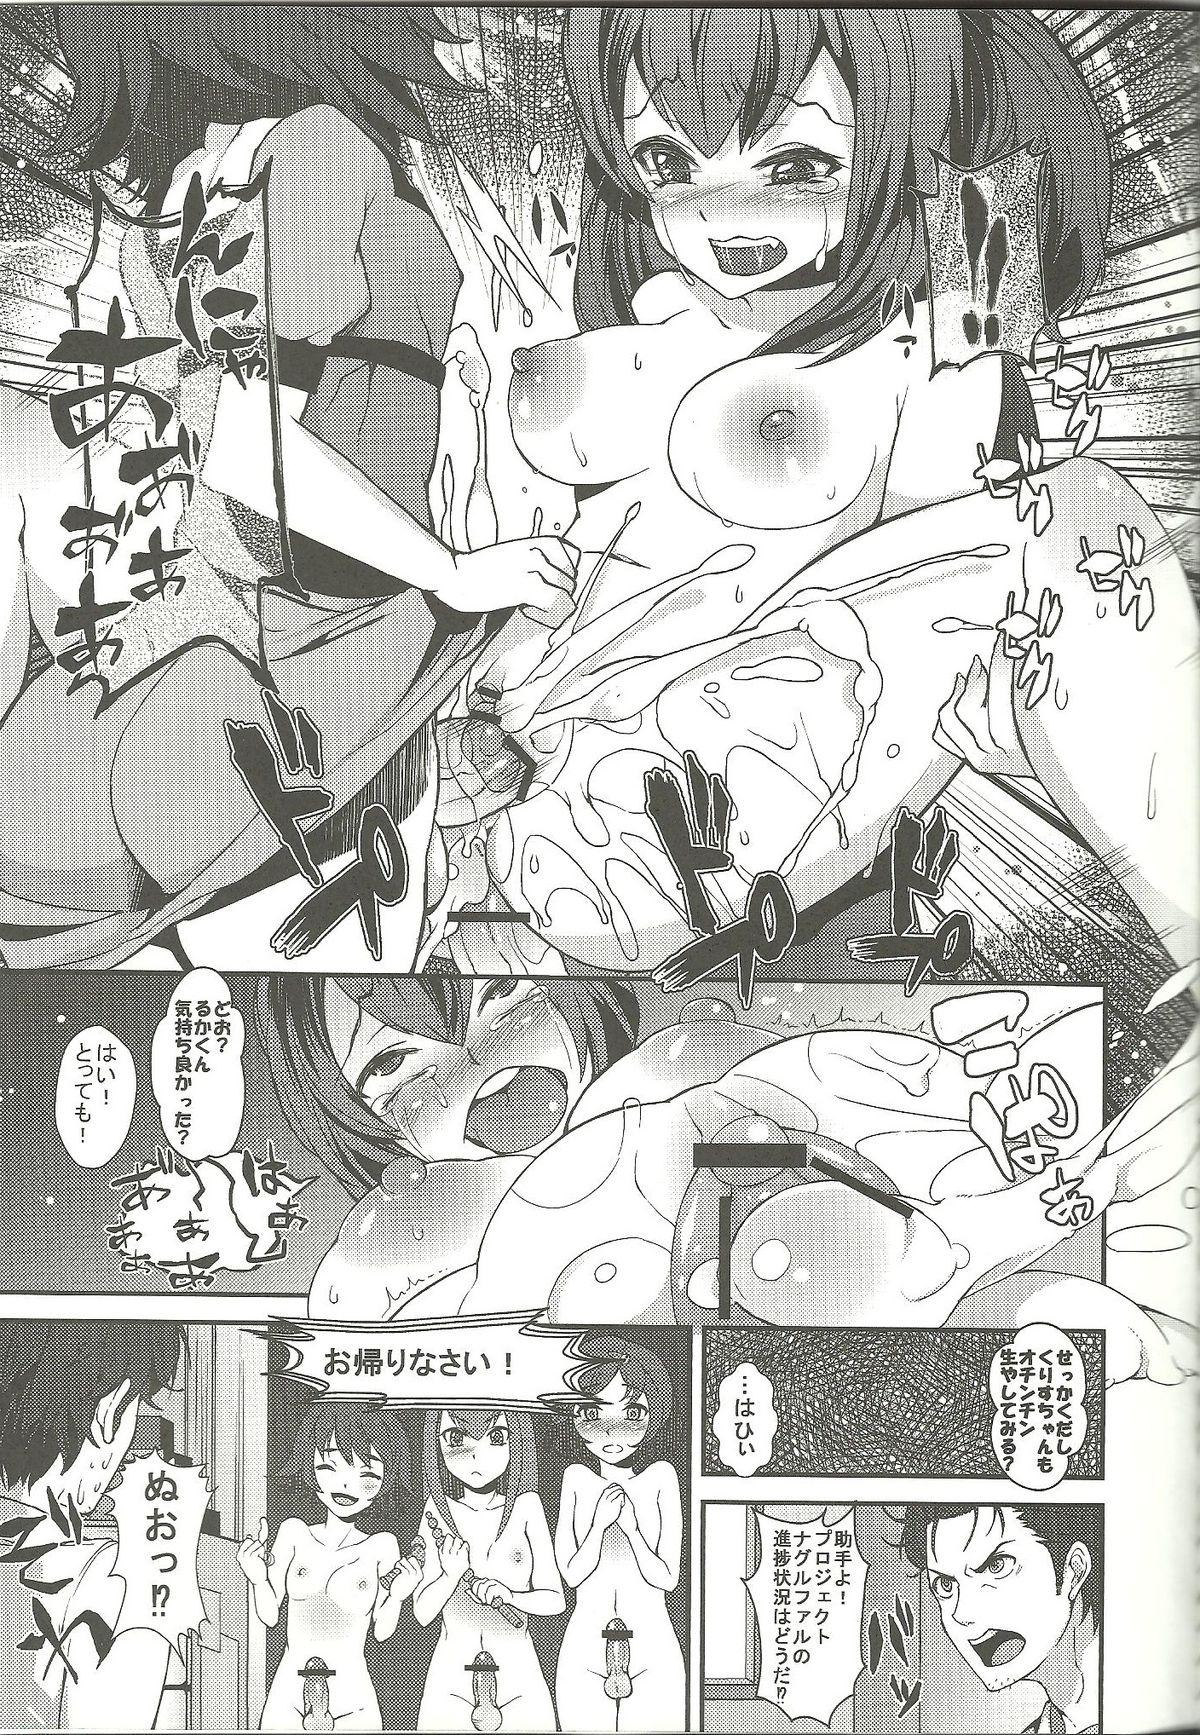 Aiyoku Inbi no Sodominist 31